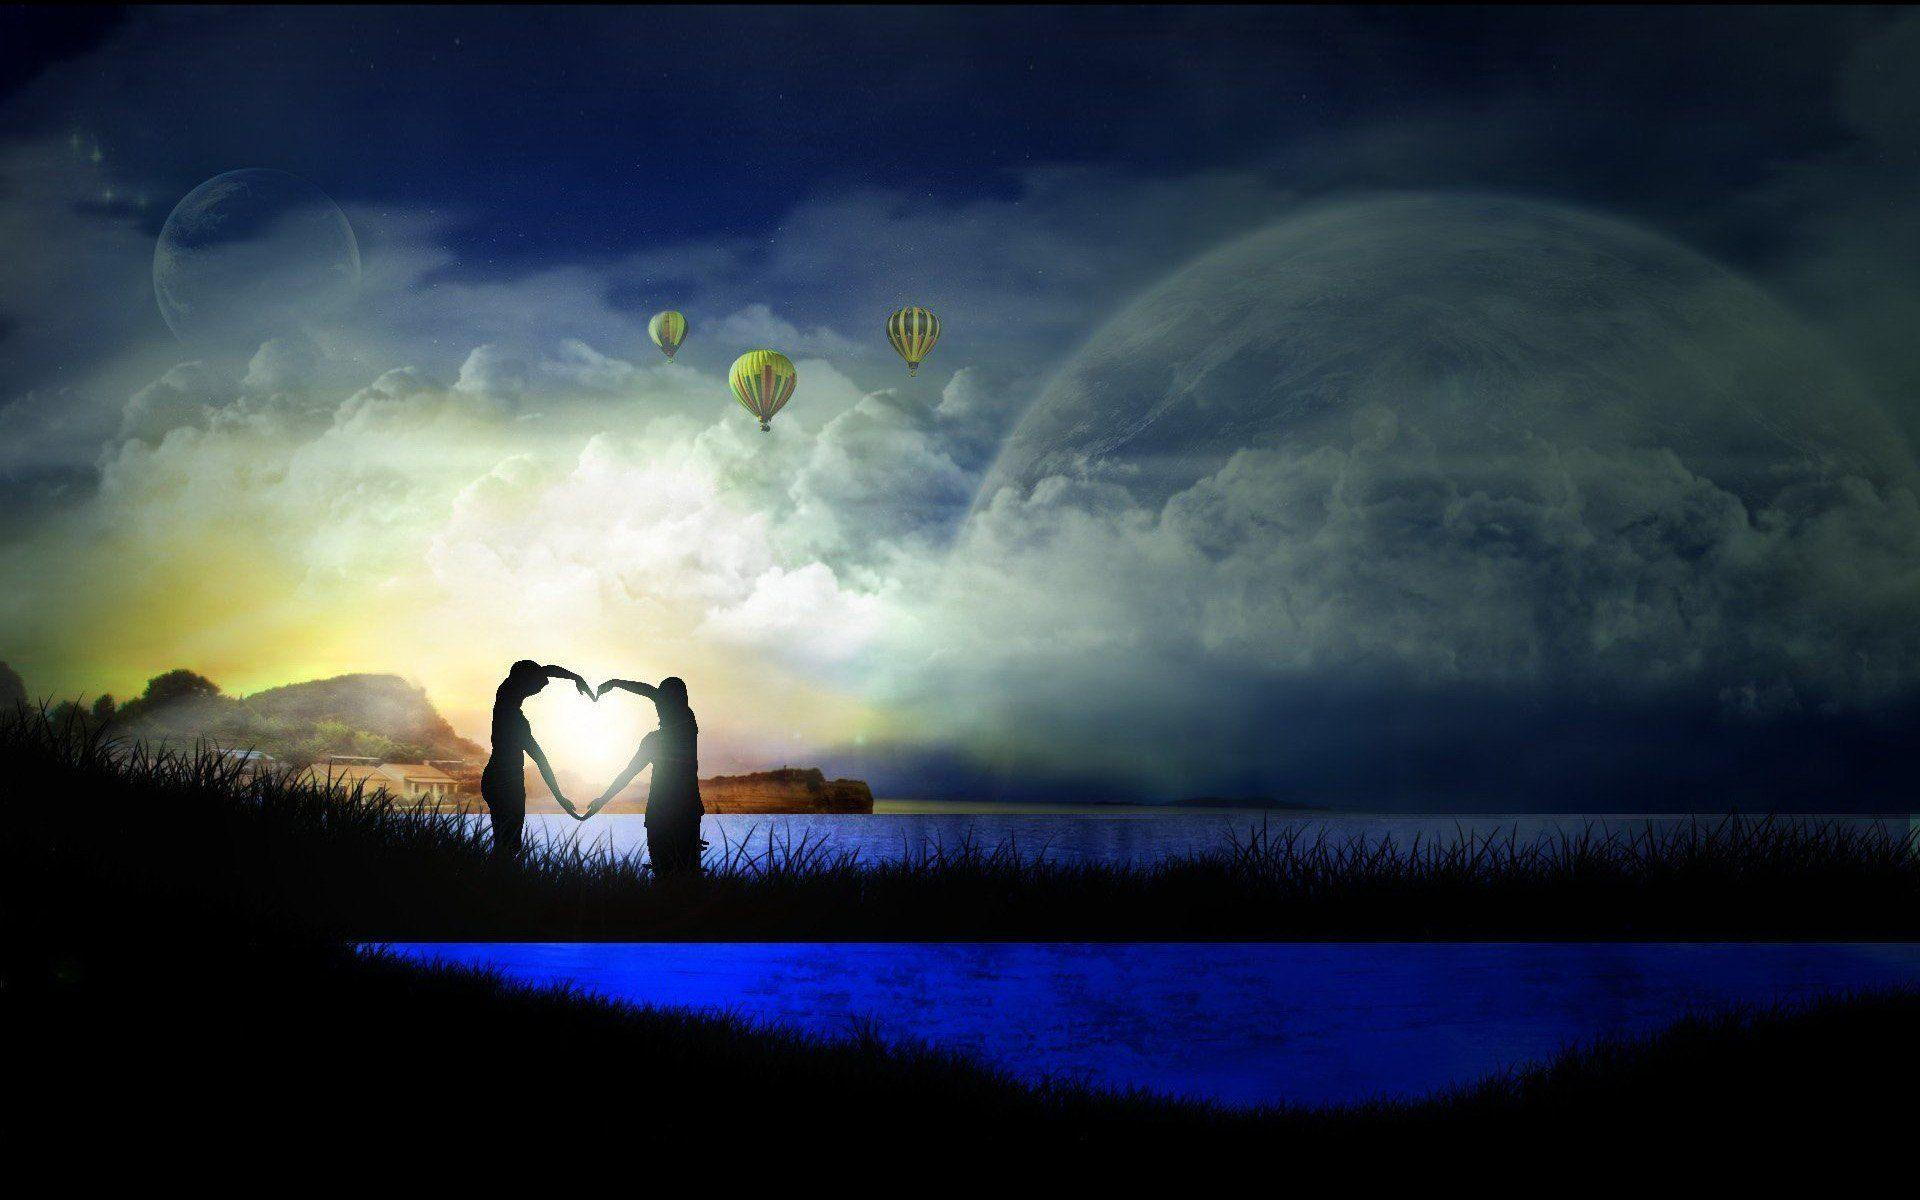 Cute Couples Wallpapers Desktop Romantic Backgrounds Pictures Wallpaper Cave